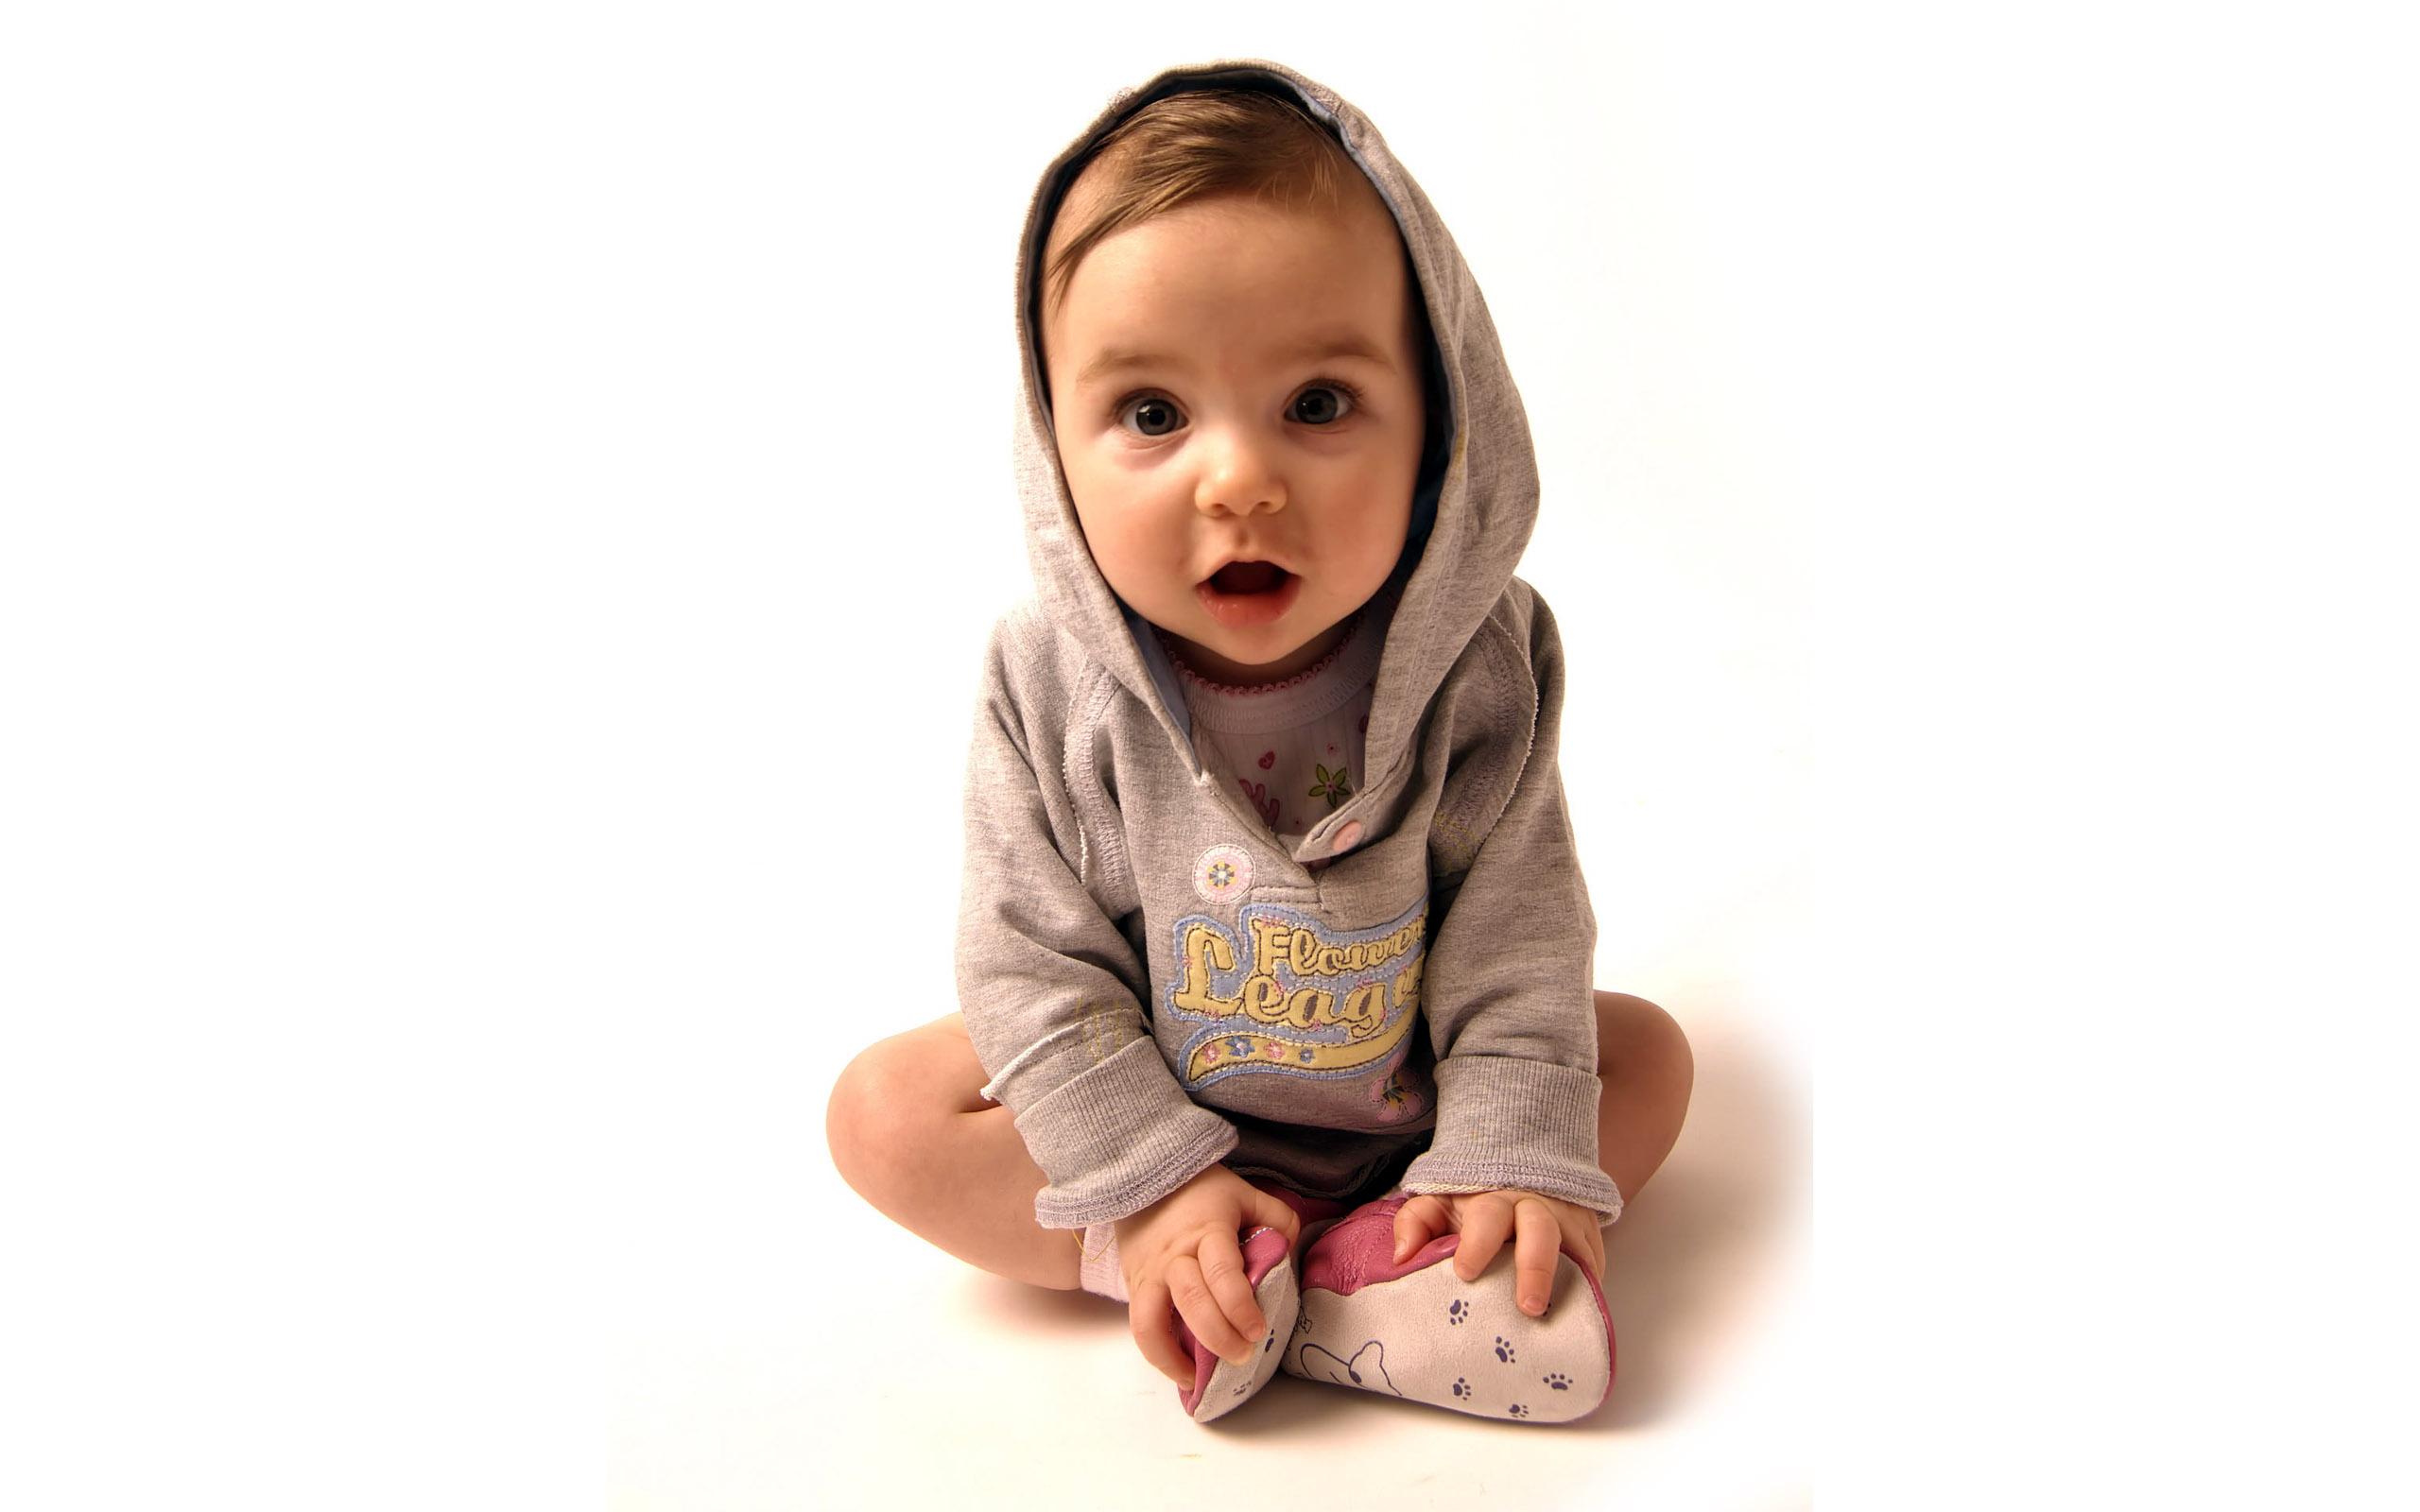 Cute Little Baby Boy Wallpapers HD Wallpapers 2560x1600